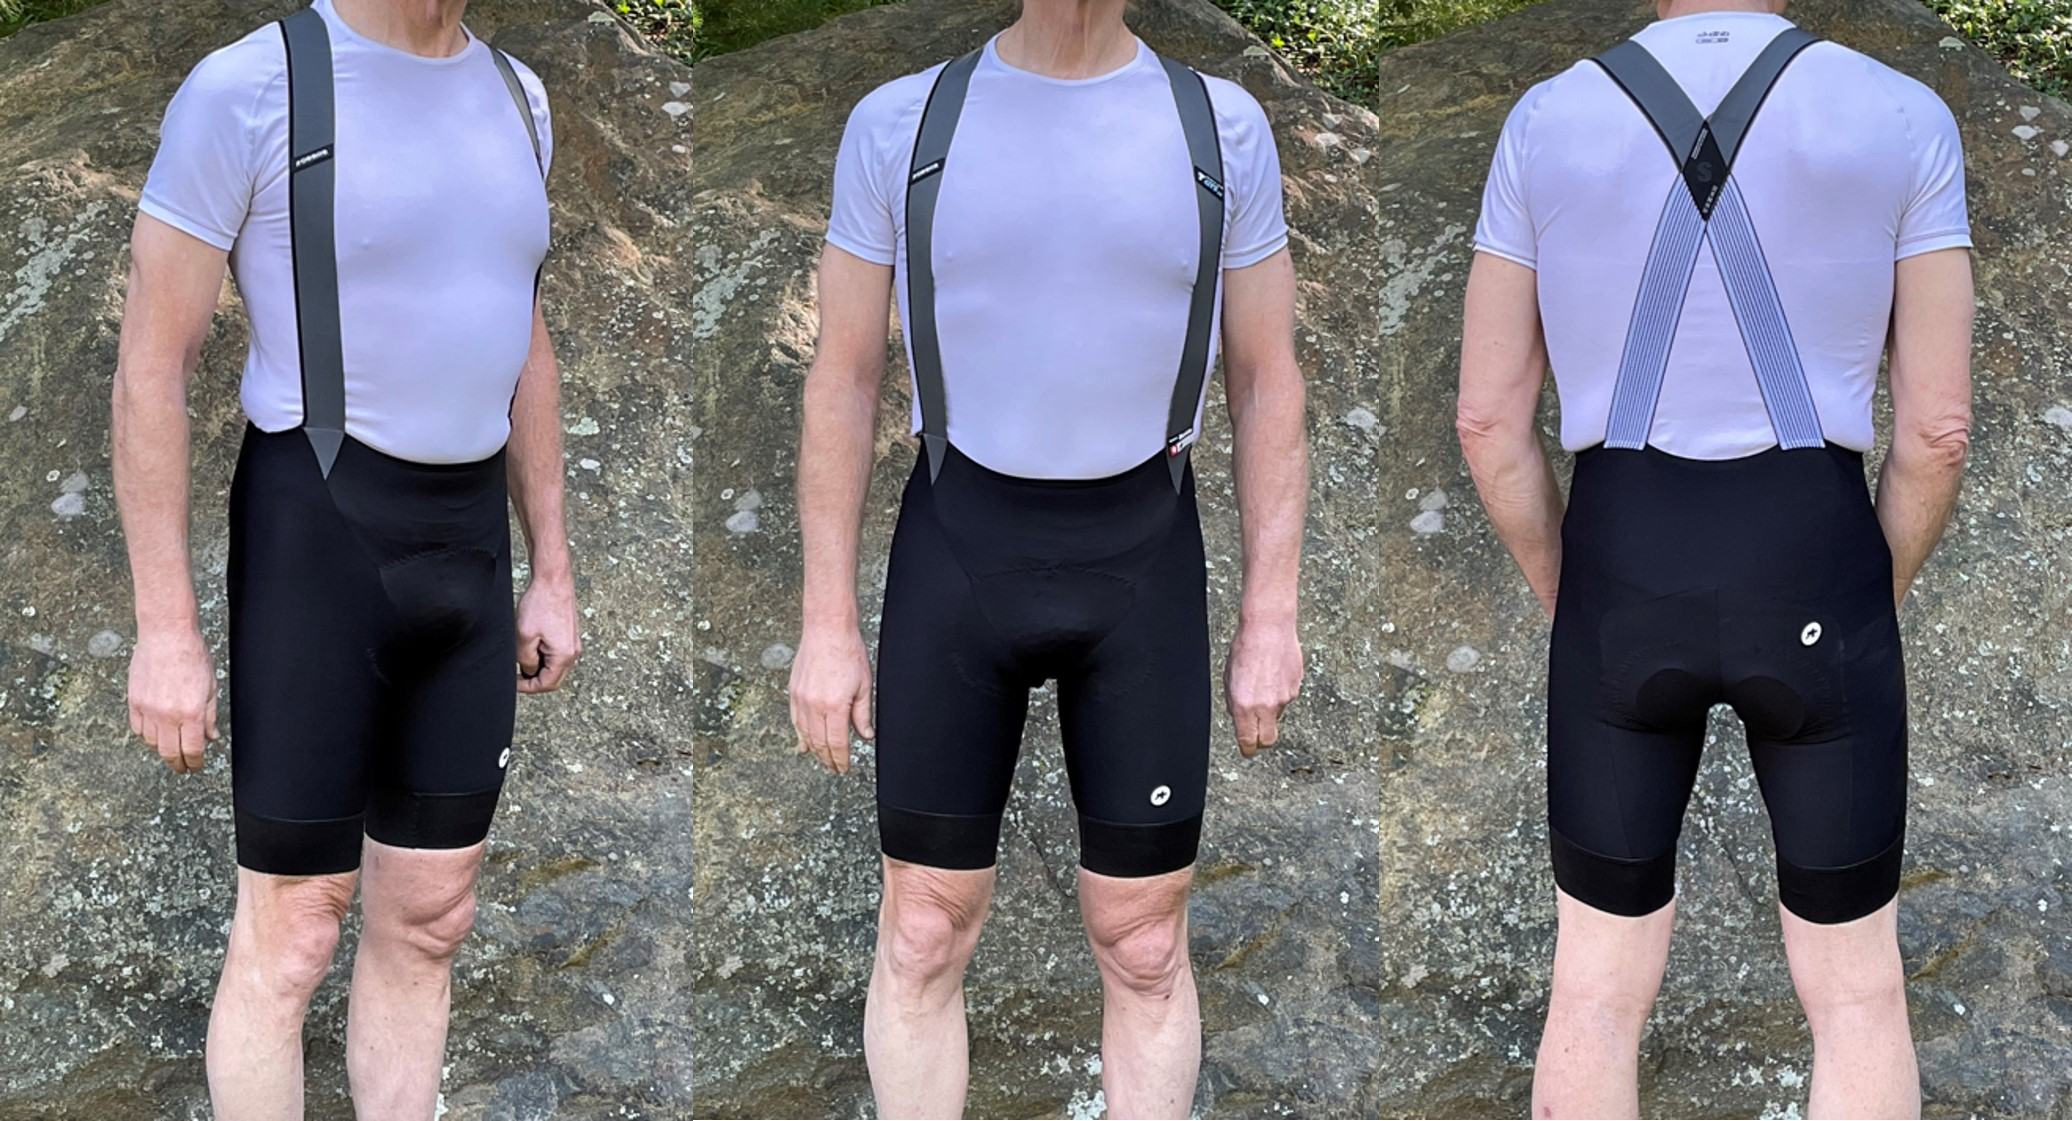 Assos Mille GTS Bib Shorts